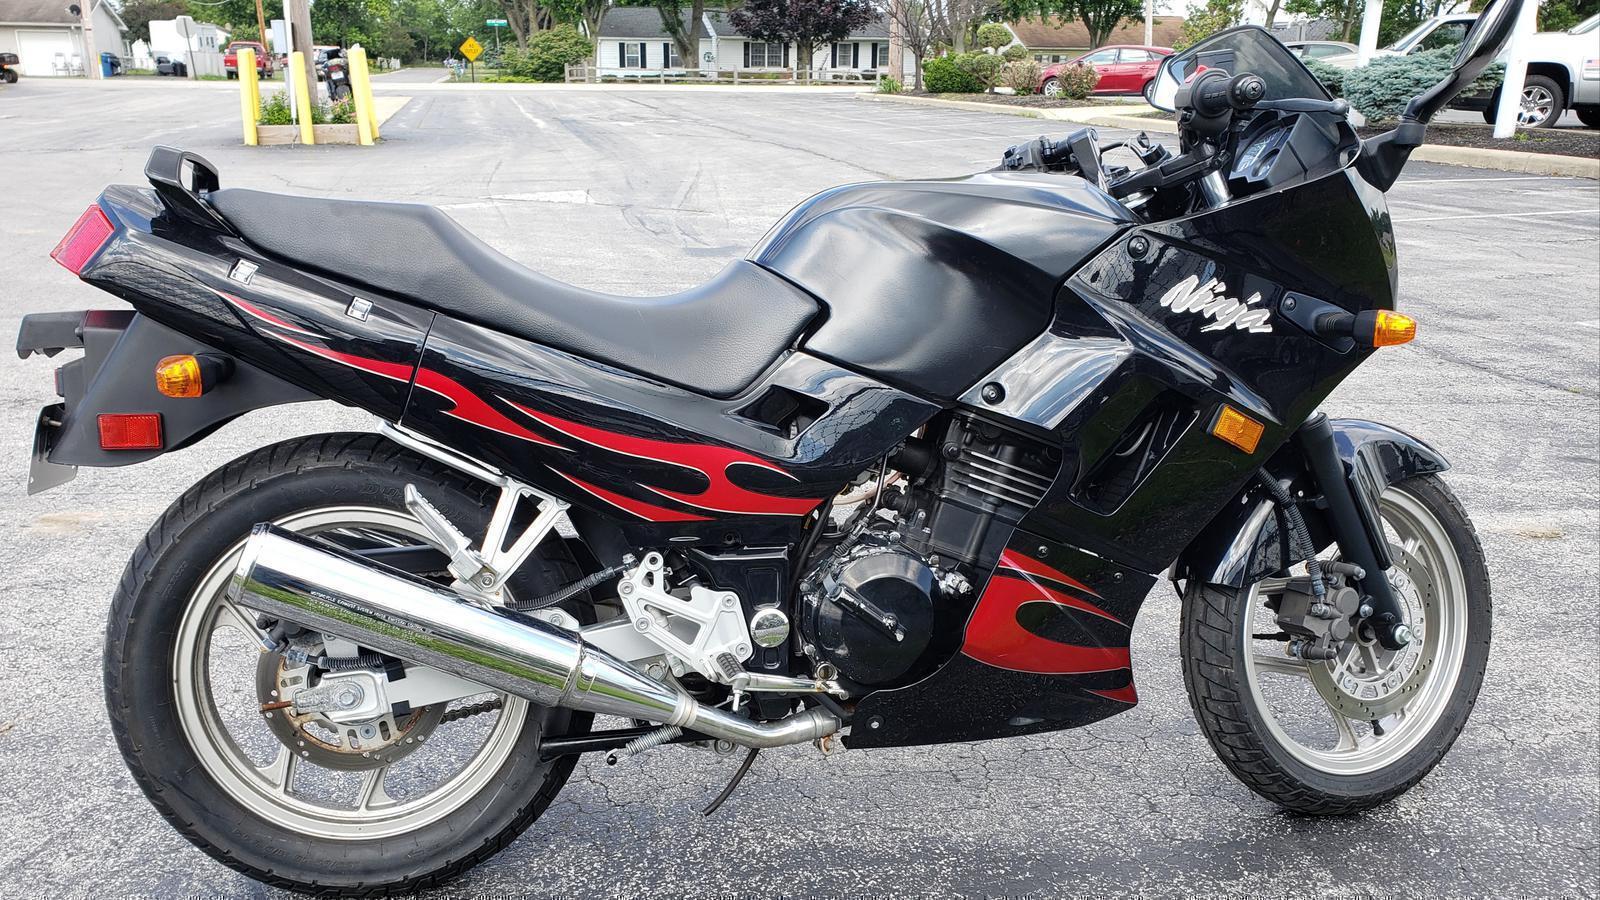 Tremendous 2007 Kawasaki Ninja 250R Theyellowbook Wood Chair Design Ideas Theyellowbookinfo